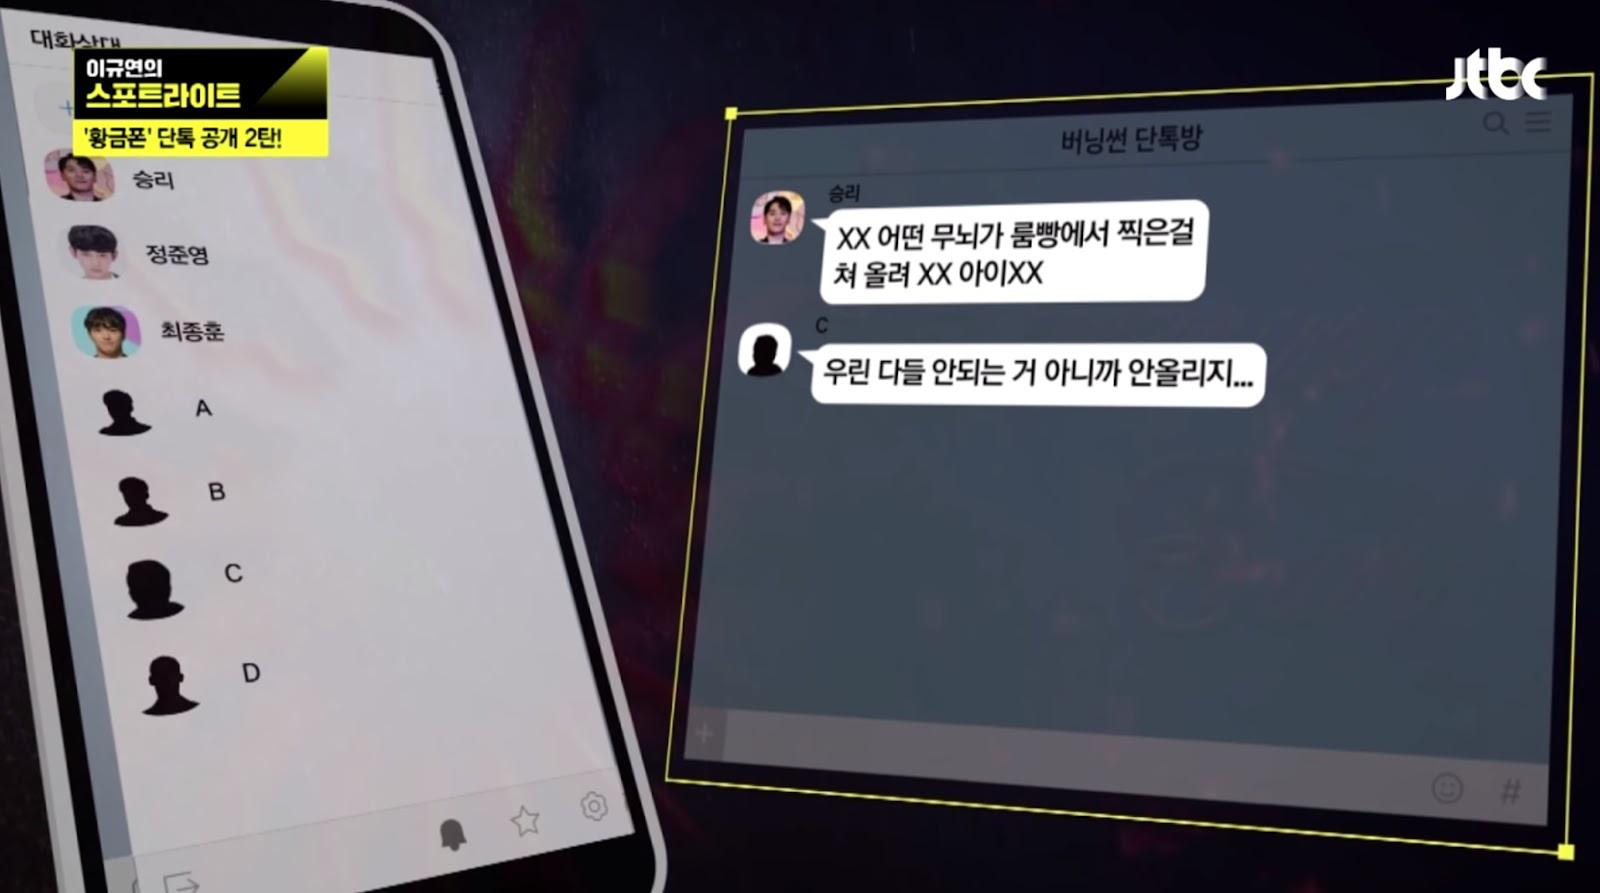 seungri chat